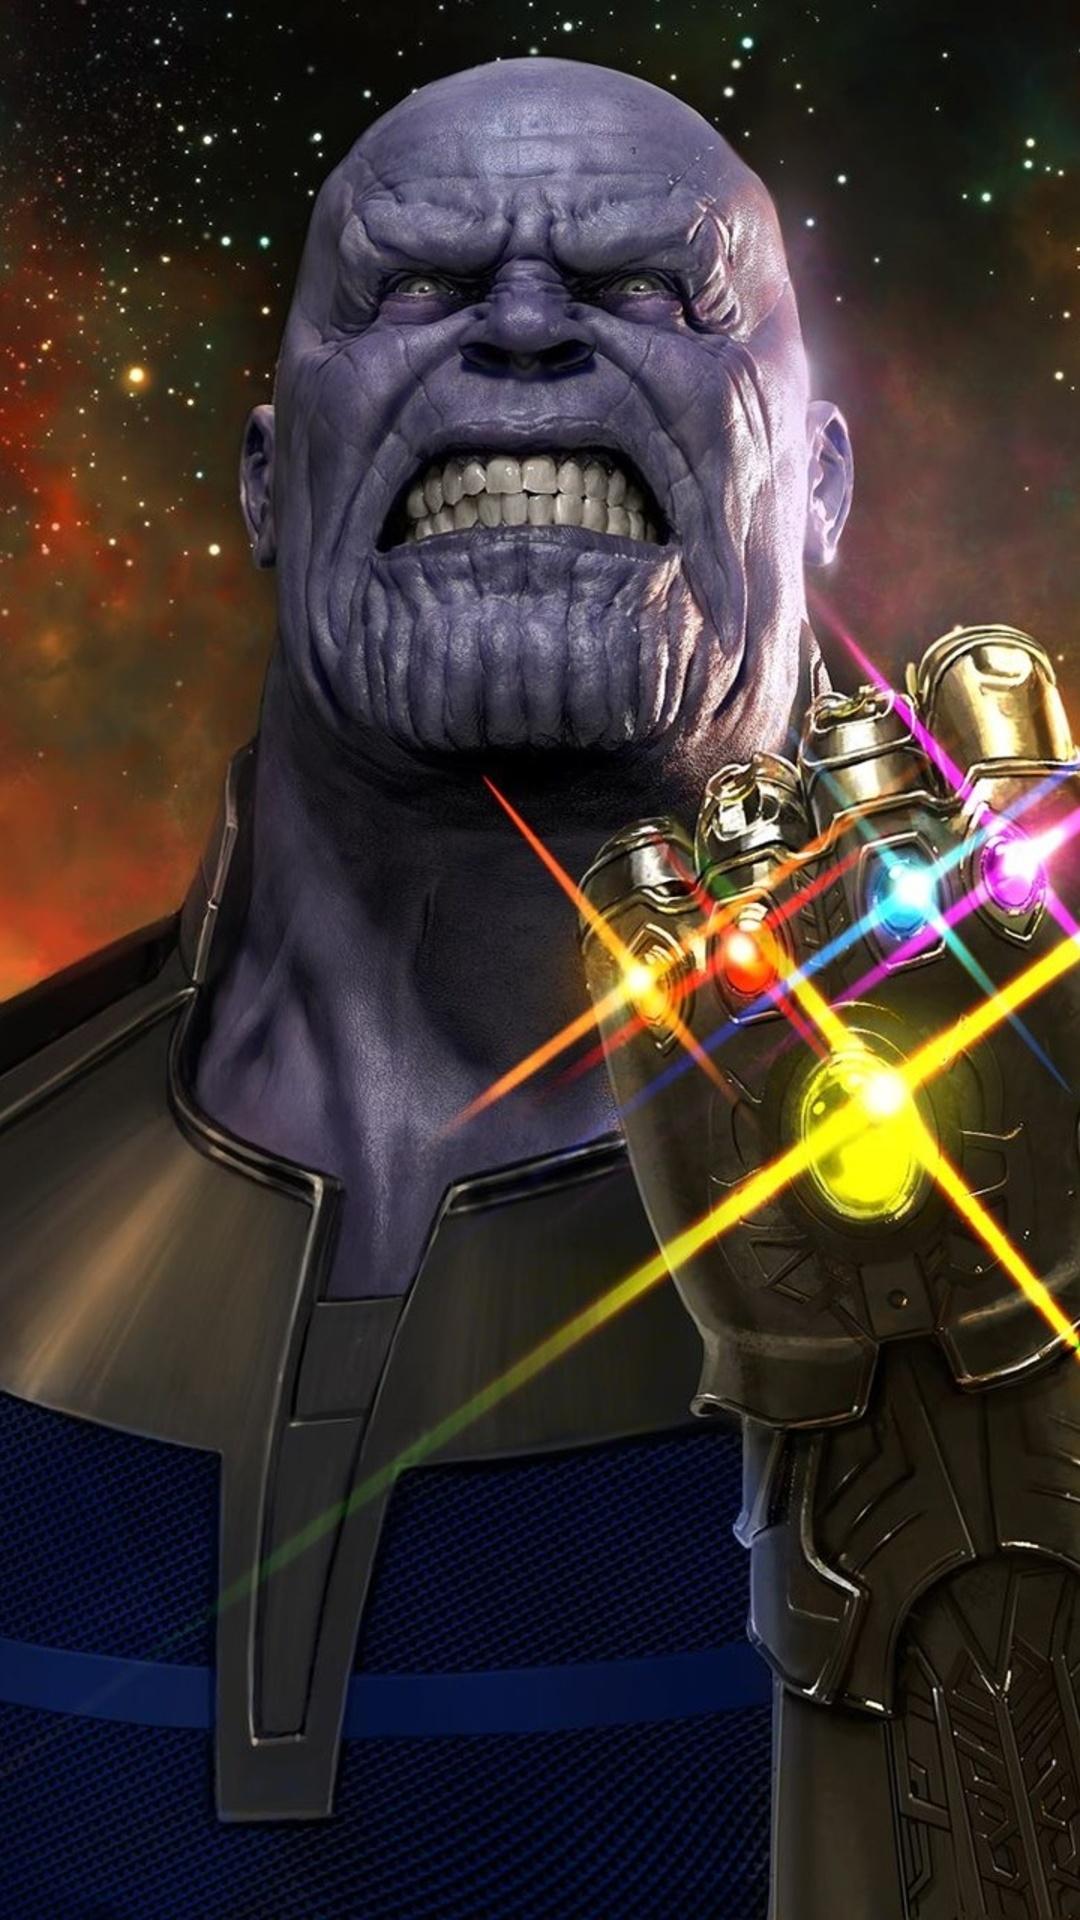 1080x1920 thanos avengers infinity war iphone 7 6s 6 plus - Avengers infinity war wallpaper iphone ...